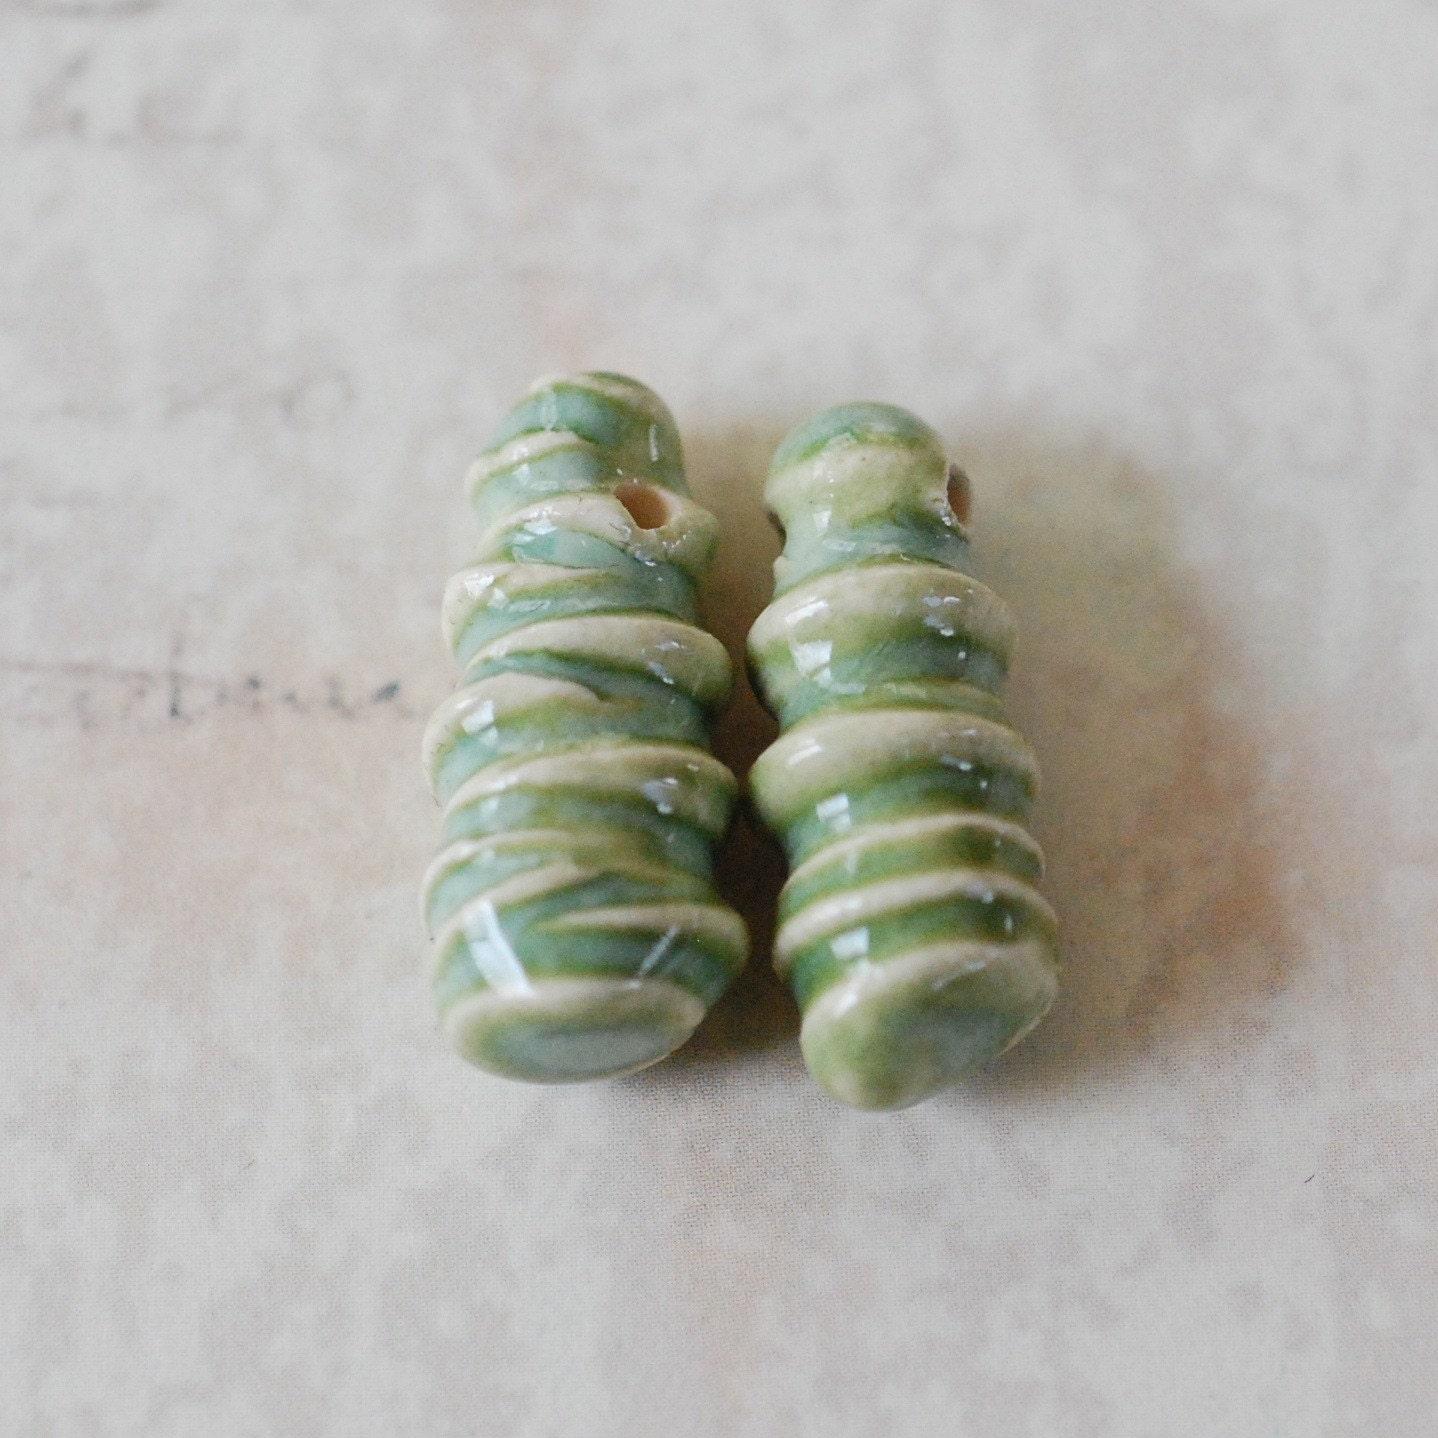 Porcelain Shards in Fern Green Glaze